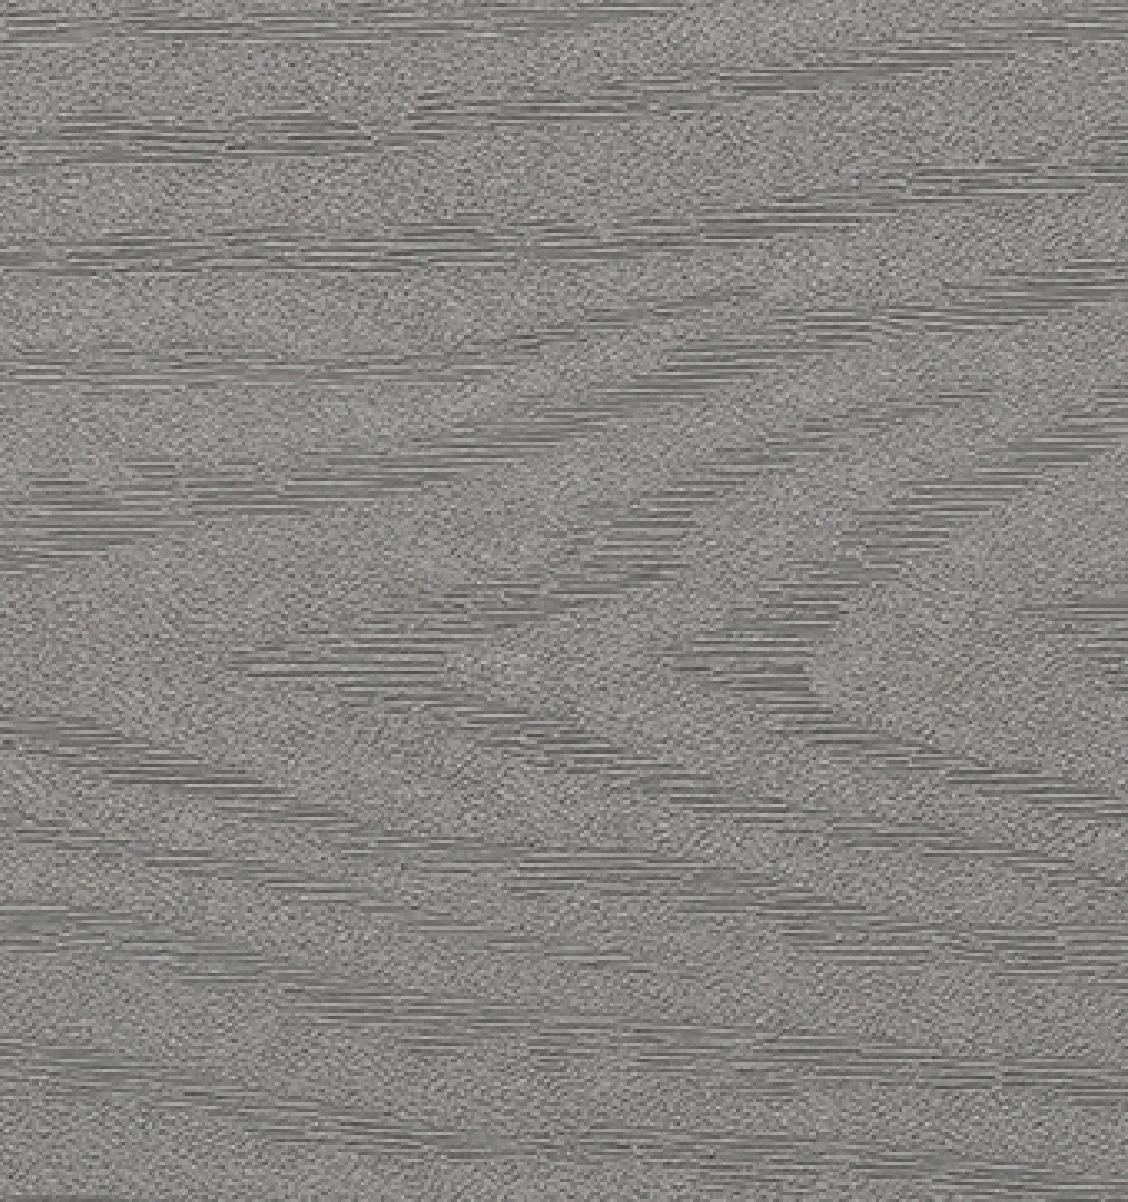 Trex Select Pebble Grey Schilling